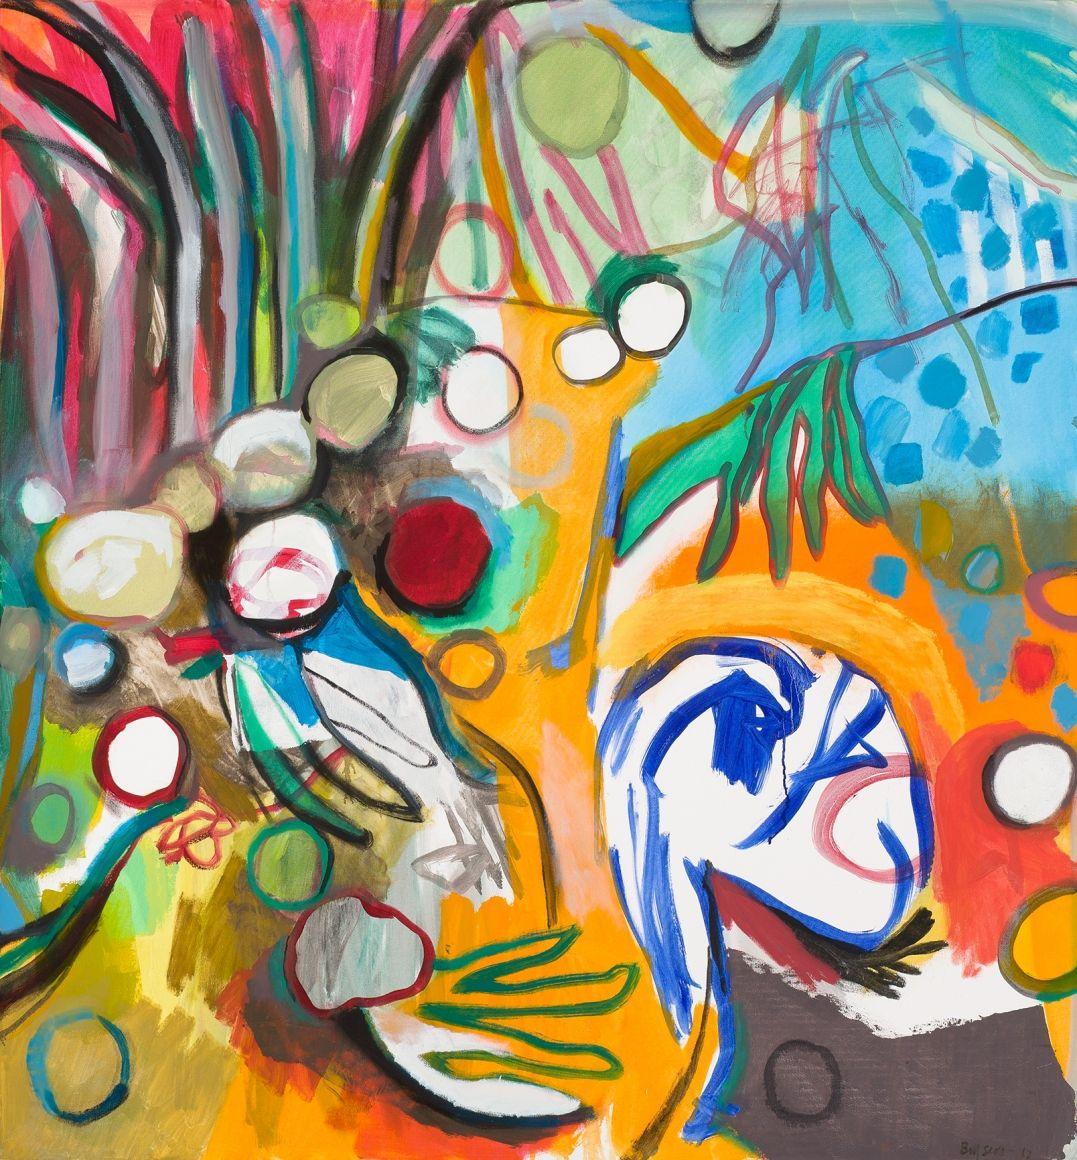 Bill scott artists hollis taggart america art